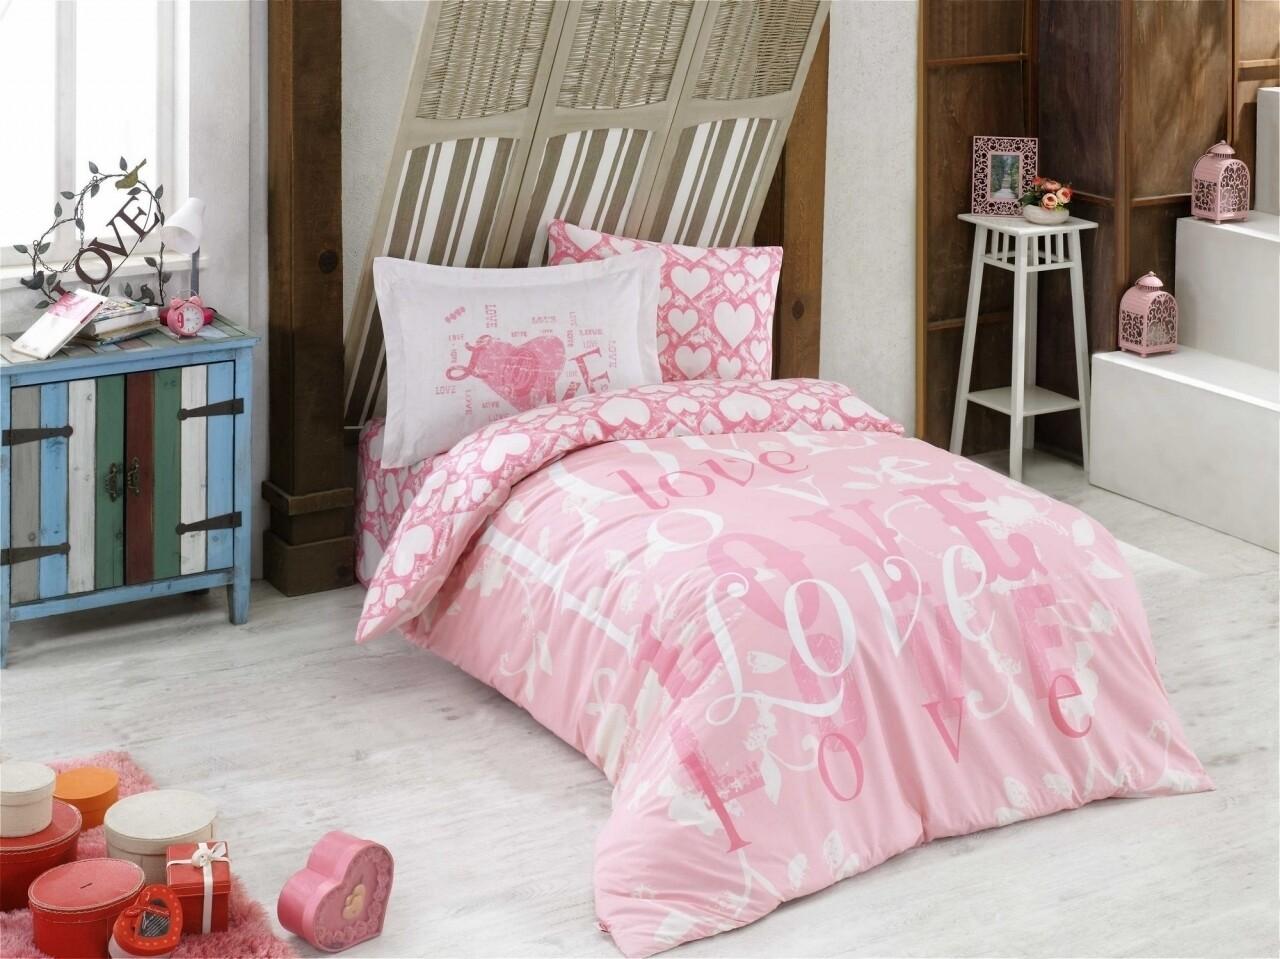 Lenjerie de pat pentru o persoana, 3 piese, 100% bumbac poplin, Hobby, Love, roz